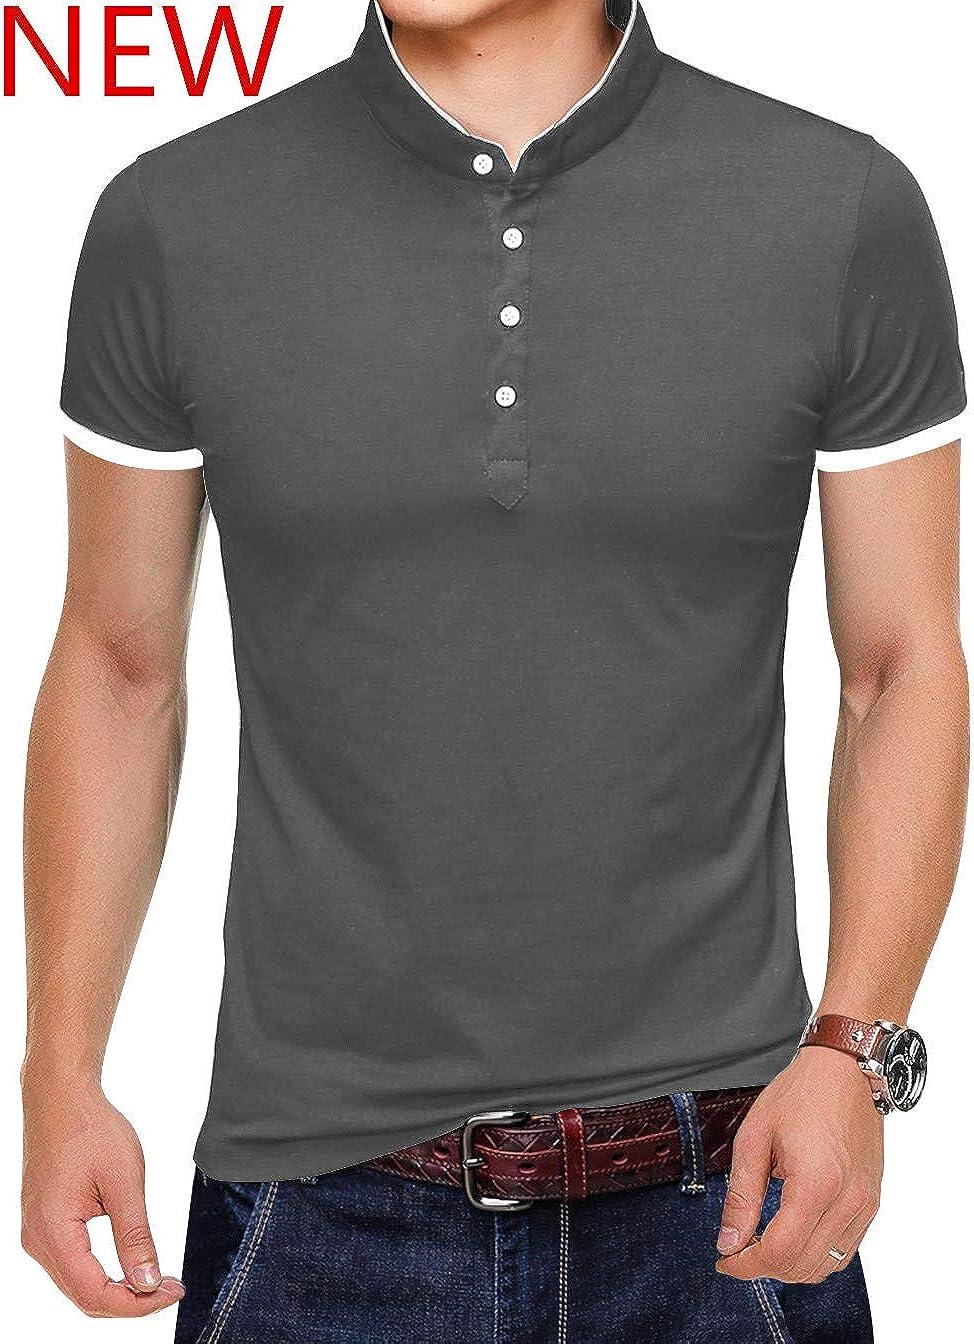 KUYIGO Men/'s Casual Slim Fit Shirts Pure Color Short Sleeve Polo Fashion T-Shirts